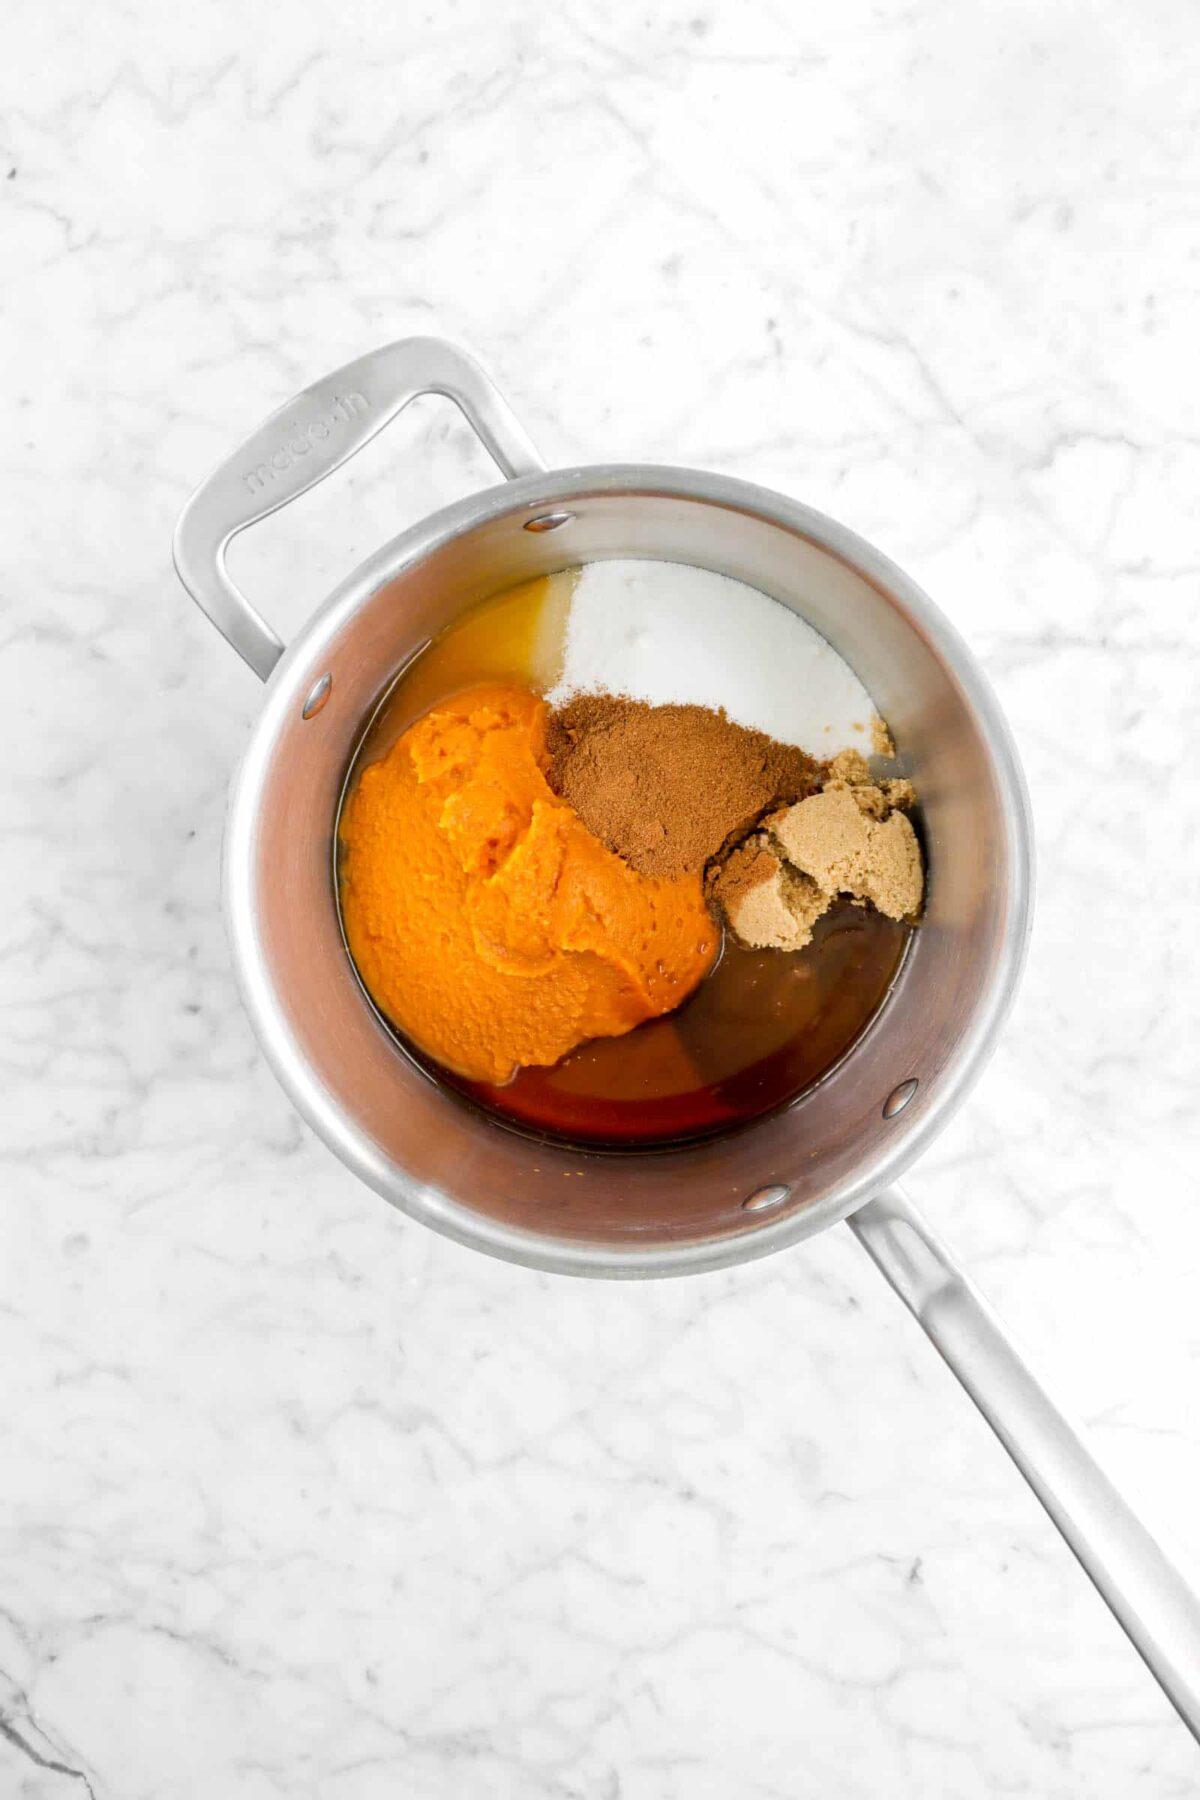 pumpkin, apple cider, sugar, brown sugar, and vanilla in a pot